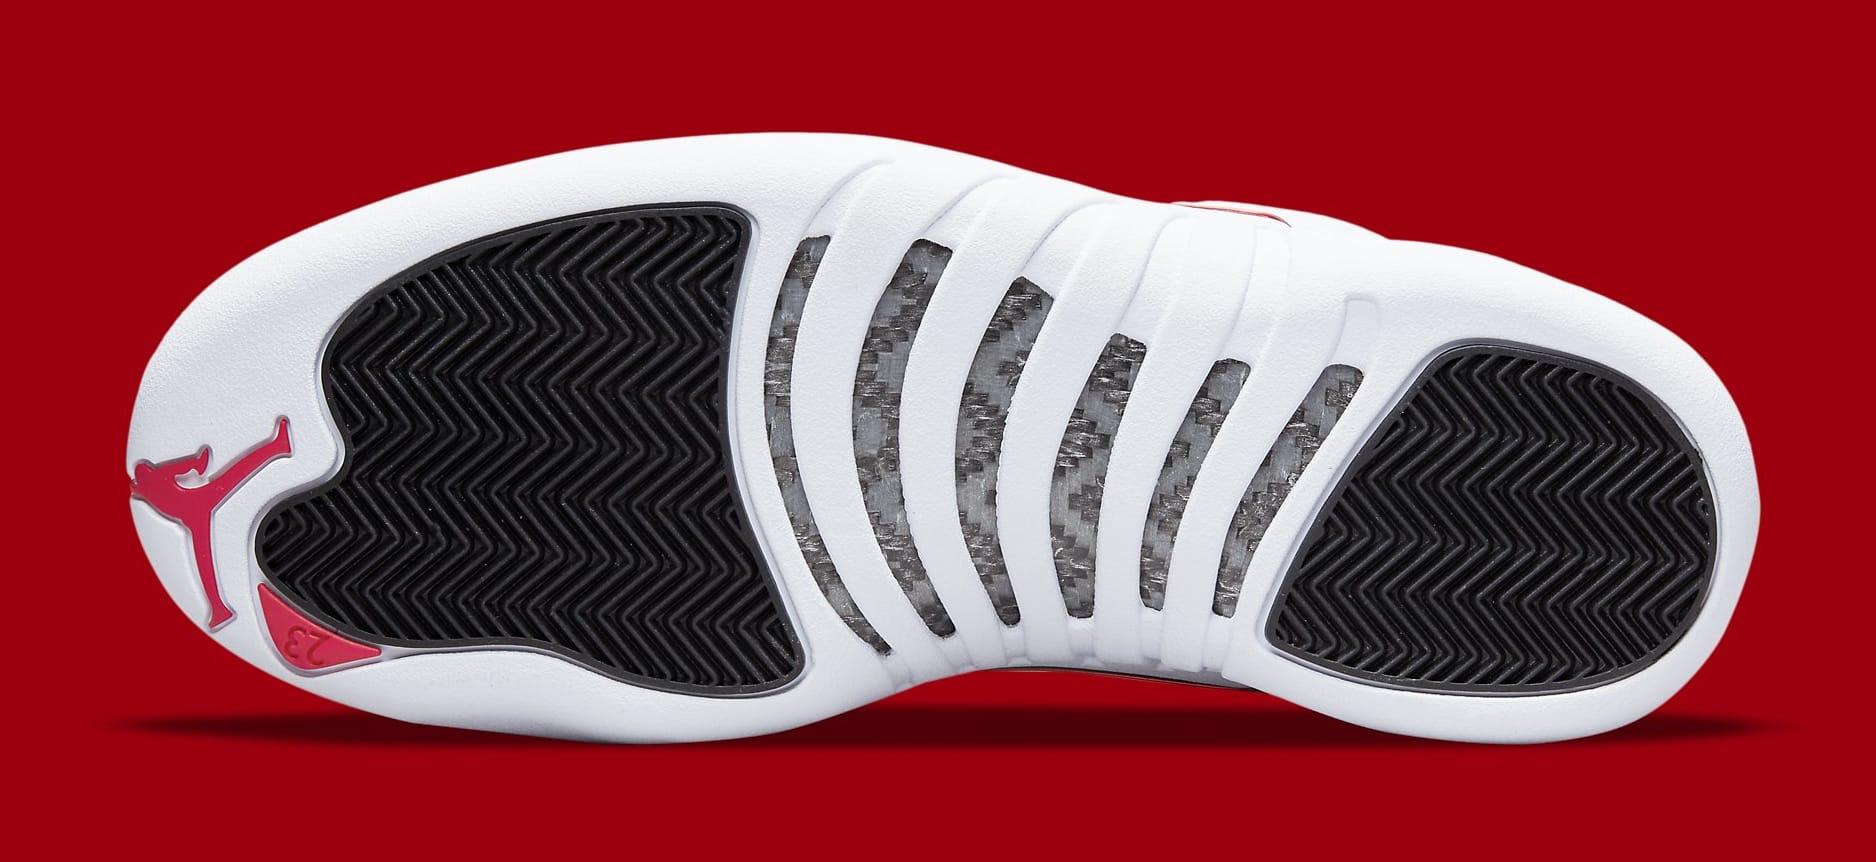 Air Jordan 12 Retro 'Twist' CT8013-106 Outsole